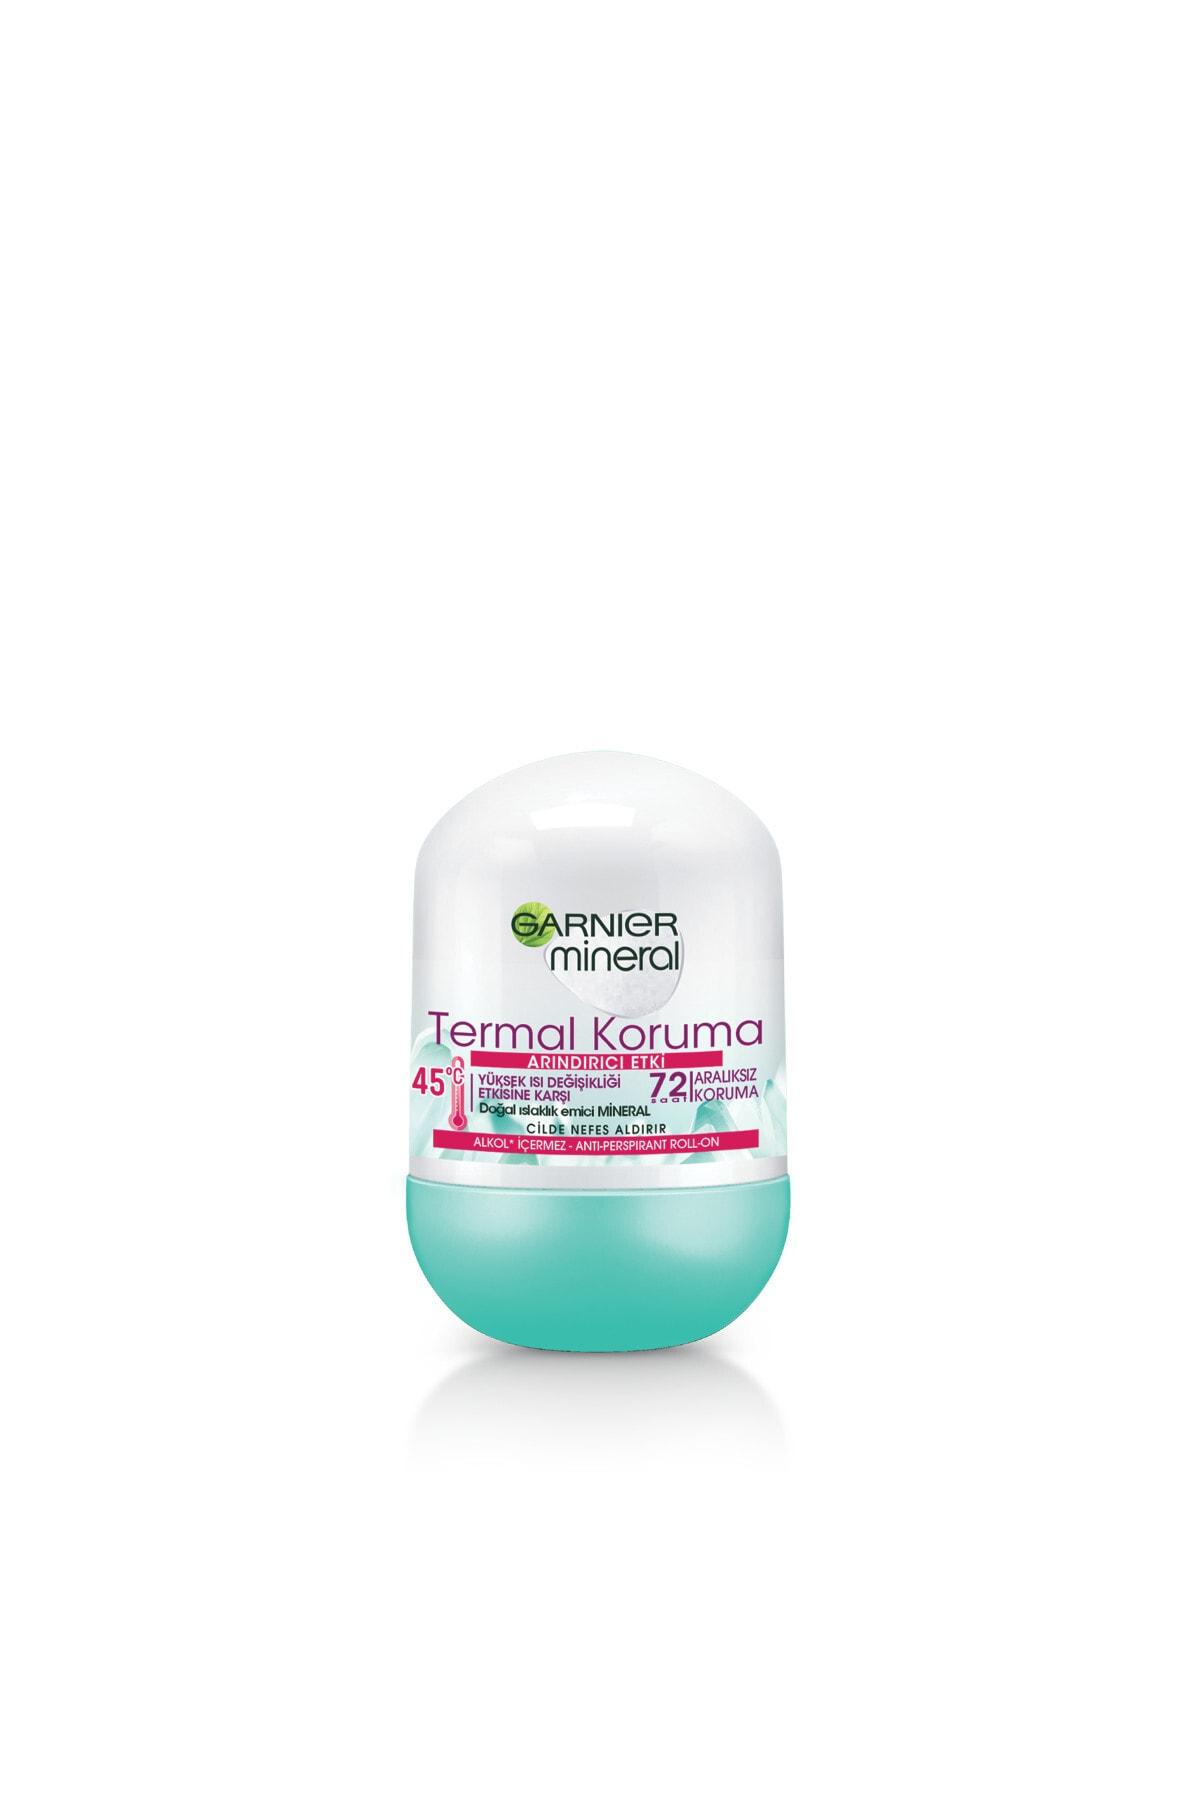 Garnier 5'li Garnier Mineral Termal Koruma Roll-On Deodorant Seti 36005419289305 2